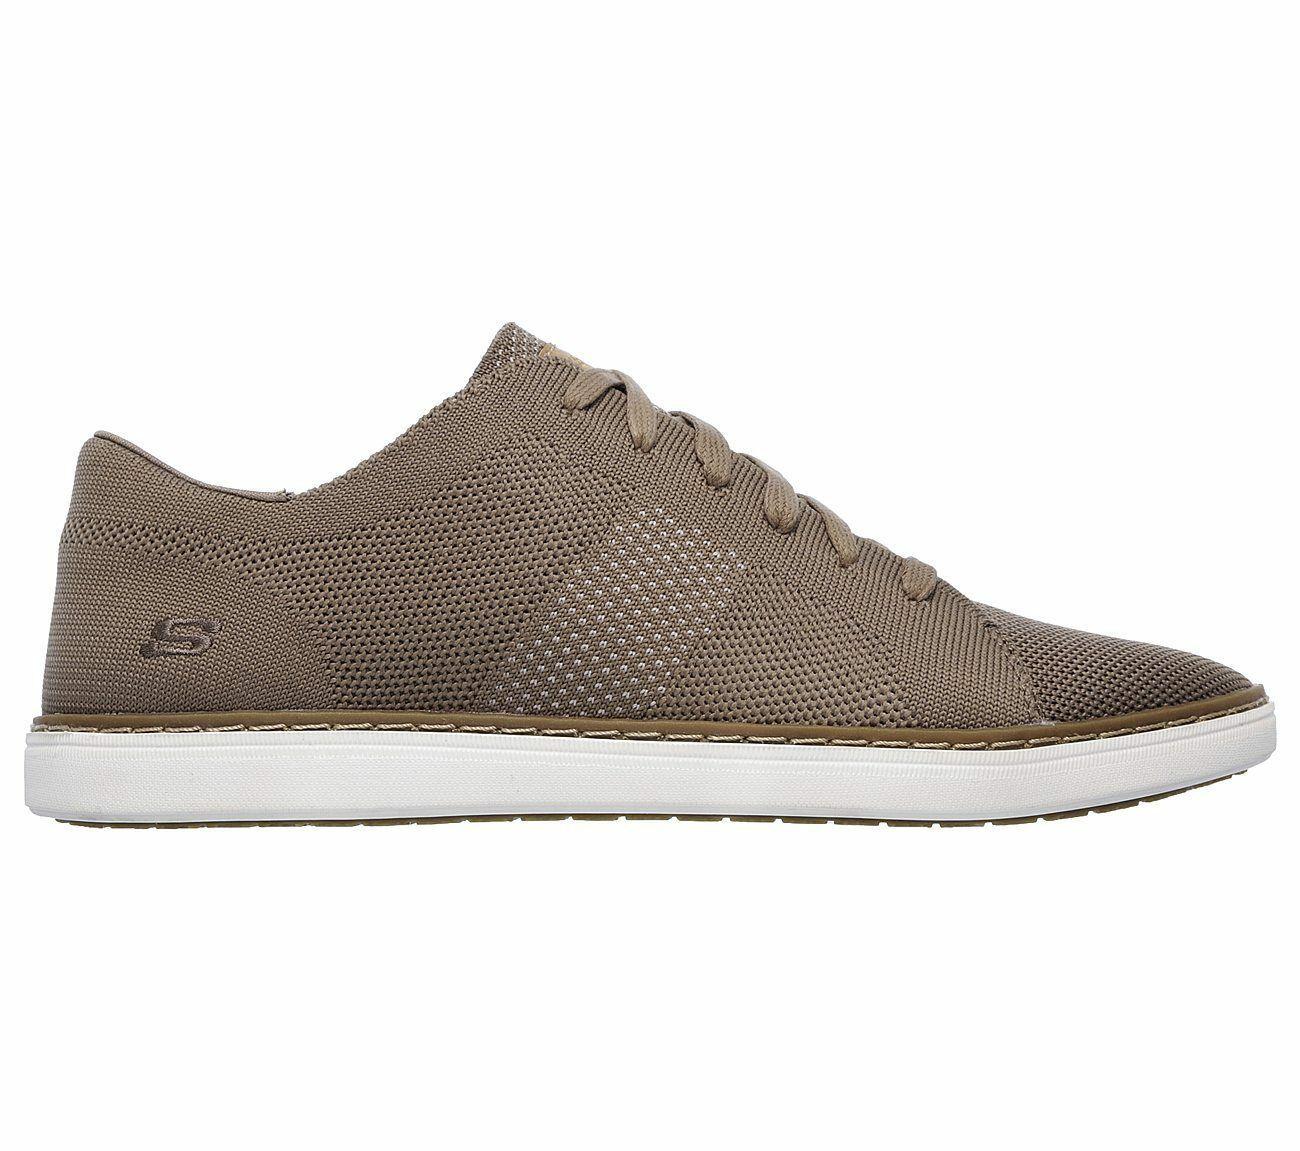 65088, SKECHERS, Lanson Revero, USA Men's Lace Up, Classic Fit, Casual Shoes image 14